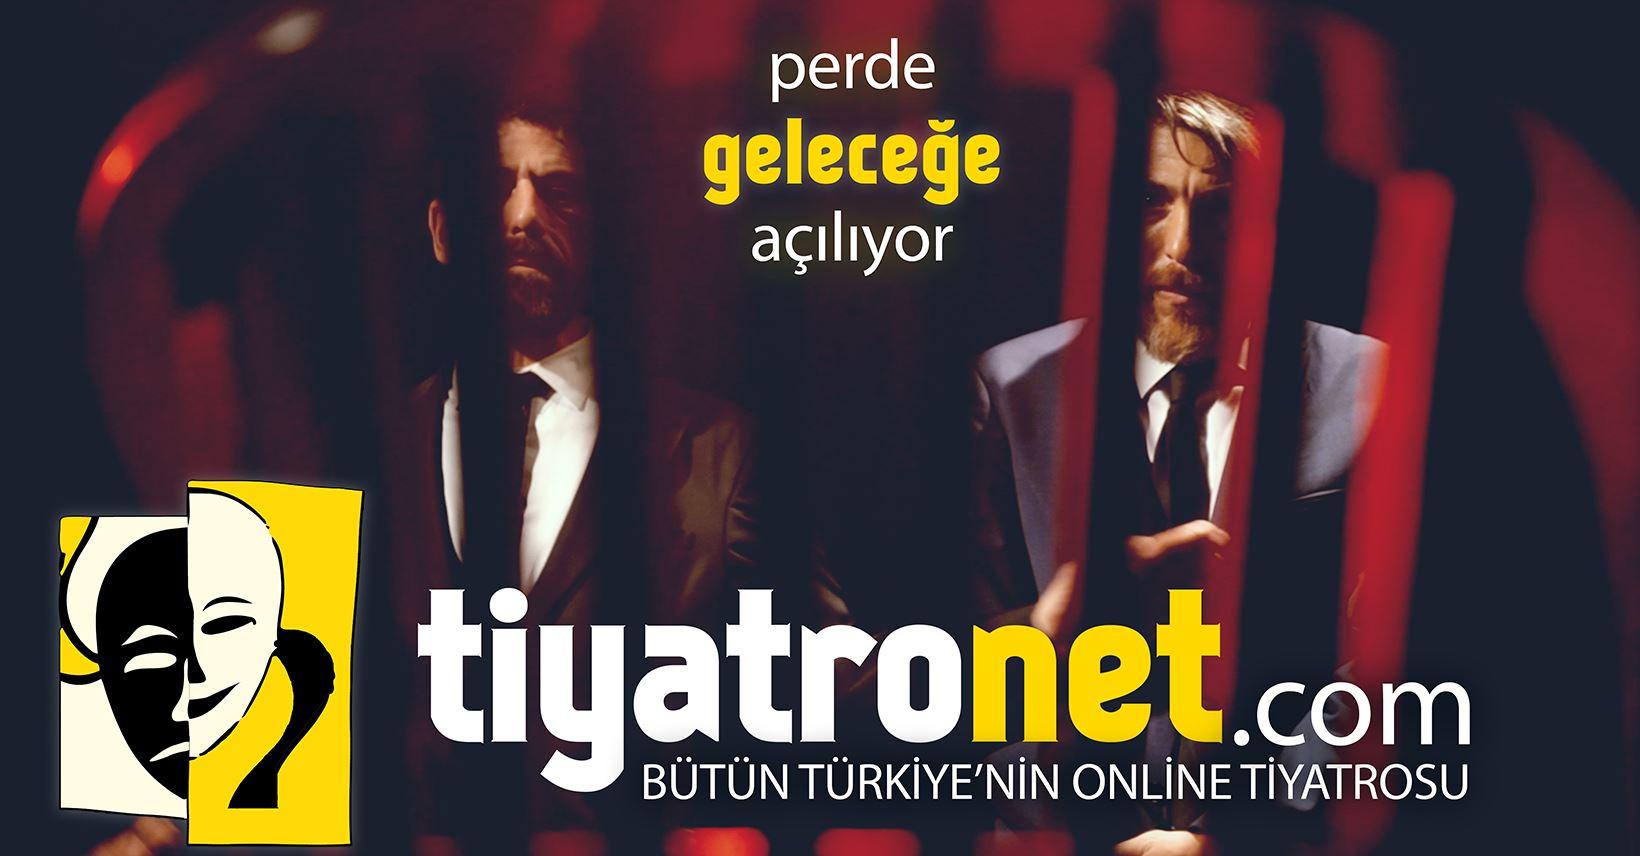 Tiyatronet